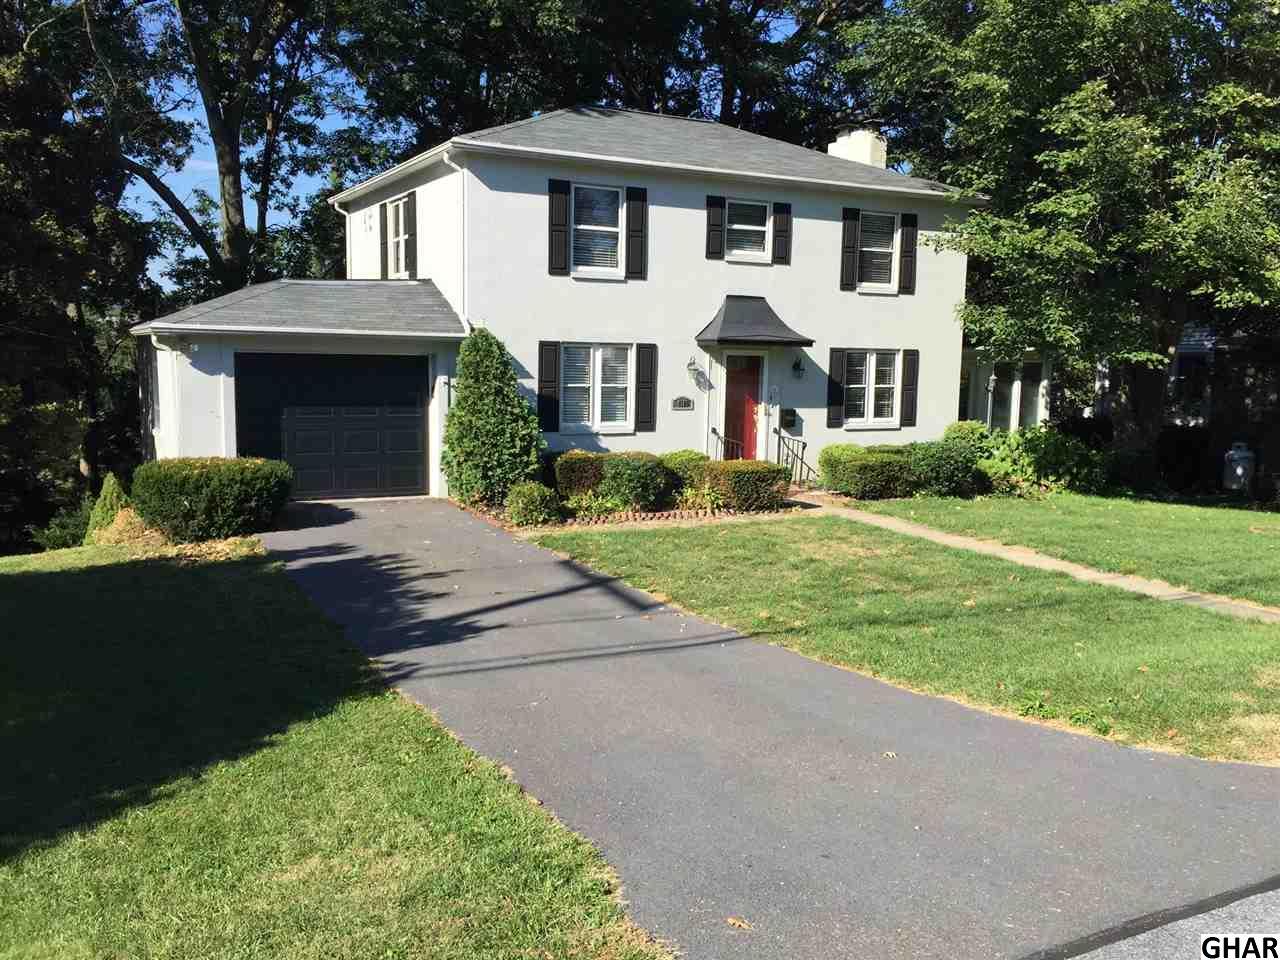 Real Estate for Sale, ListingId: 35438472, Harrisburg,PA17112